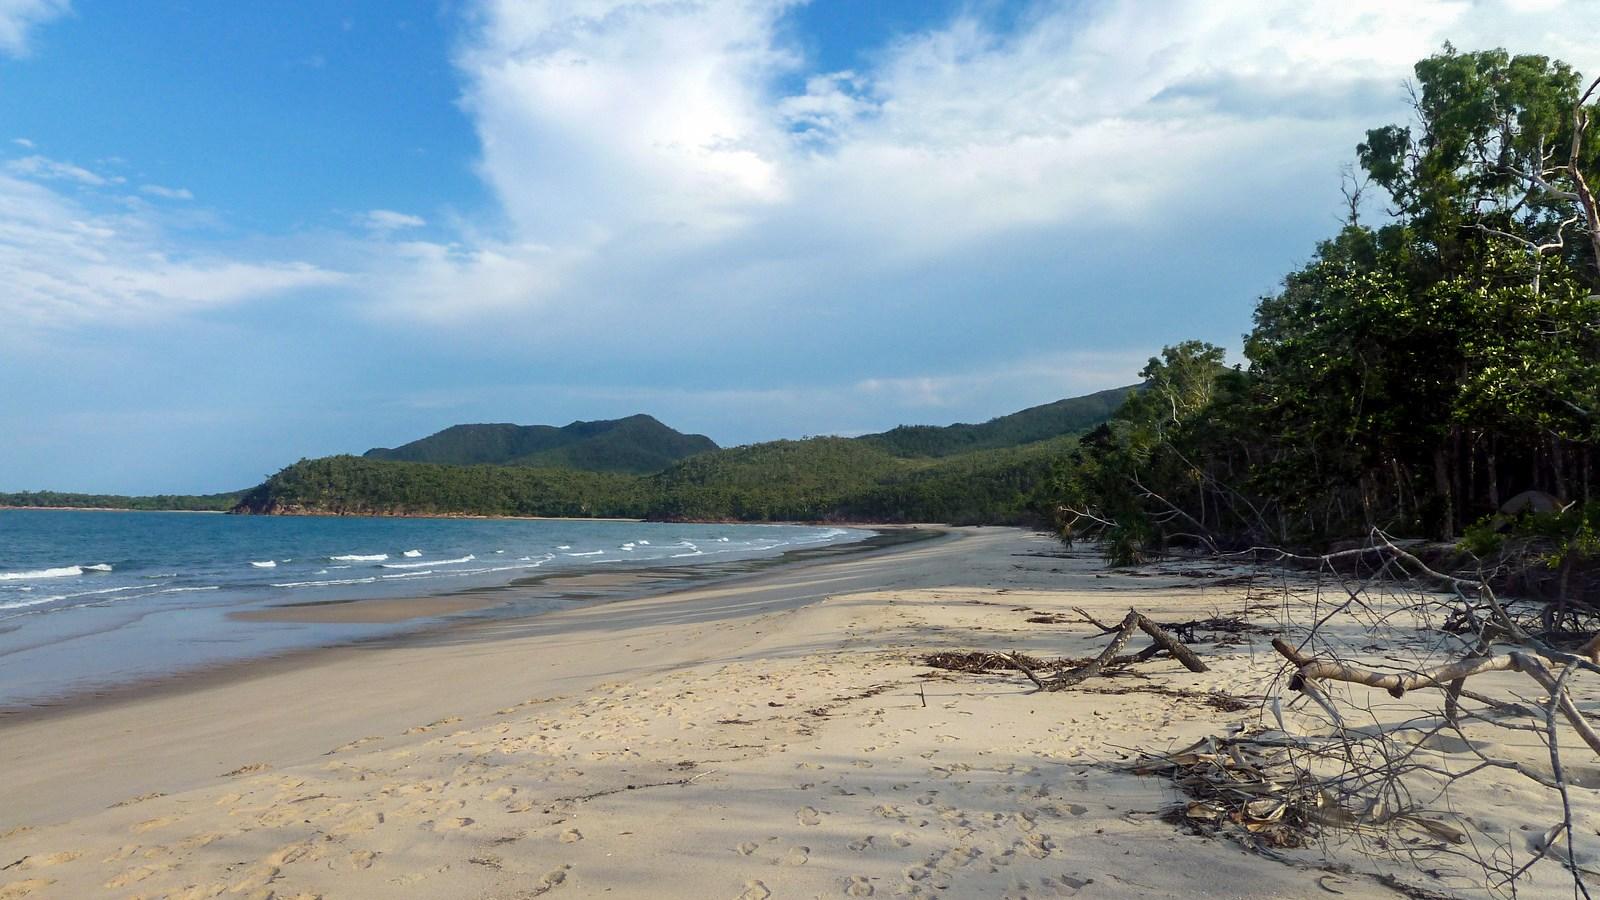 a photo of the beach campsite on hinchinbrook island.